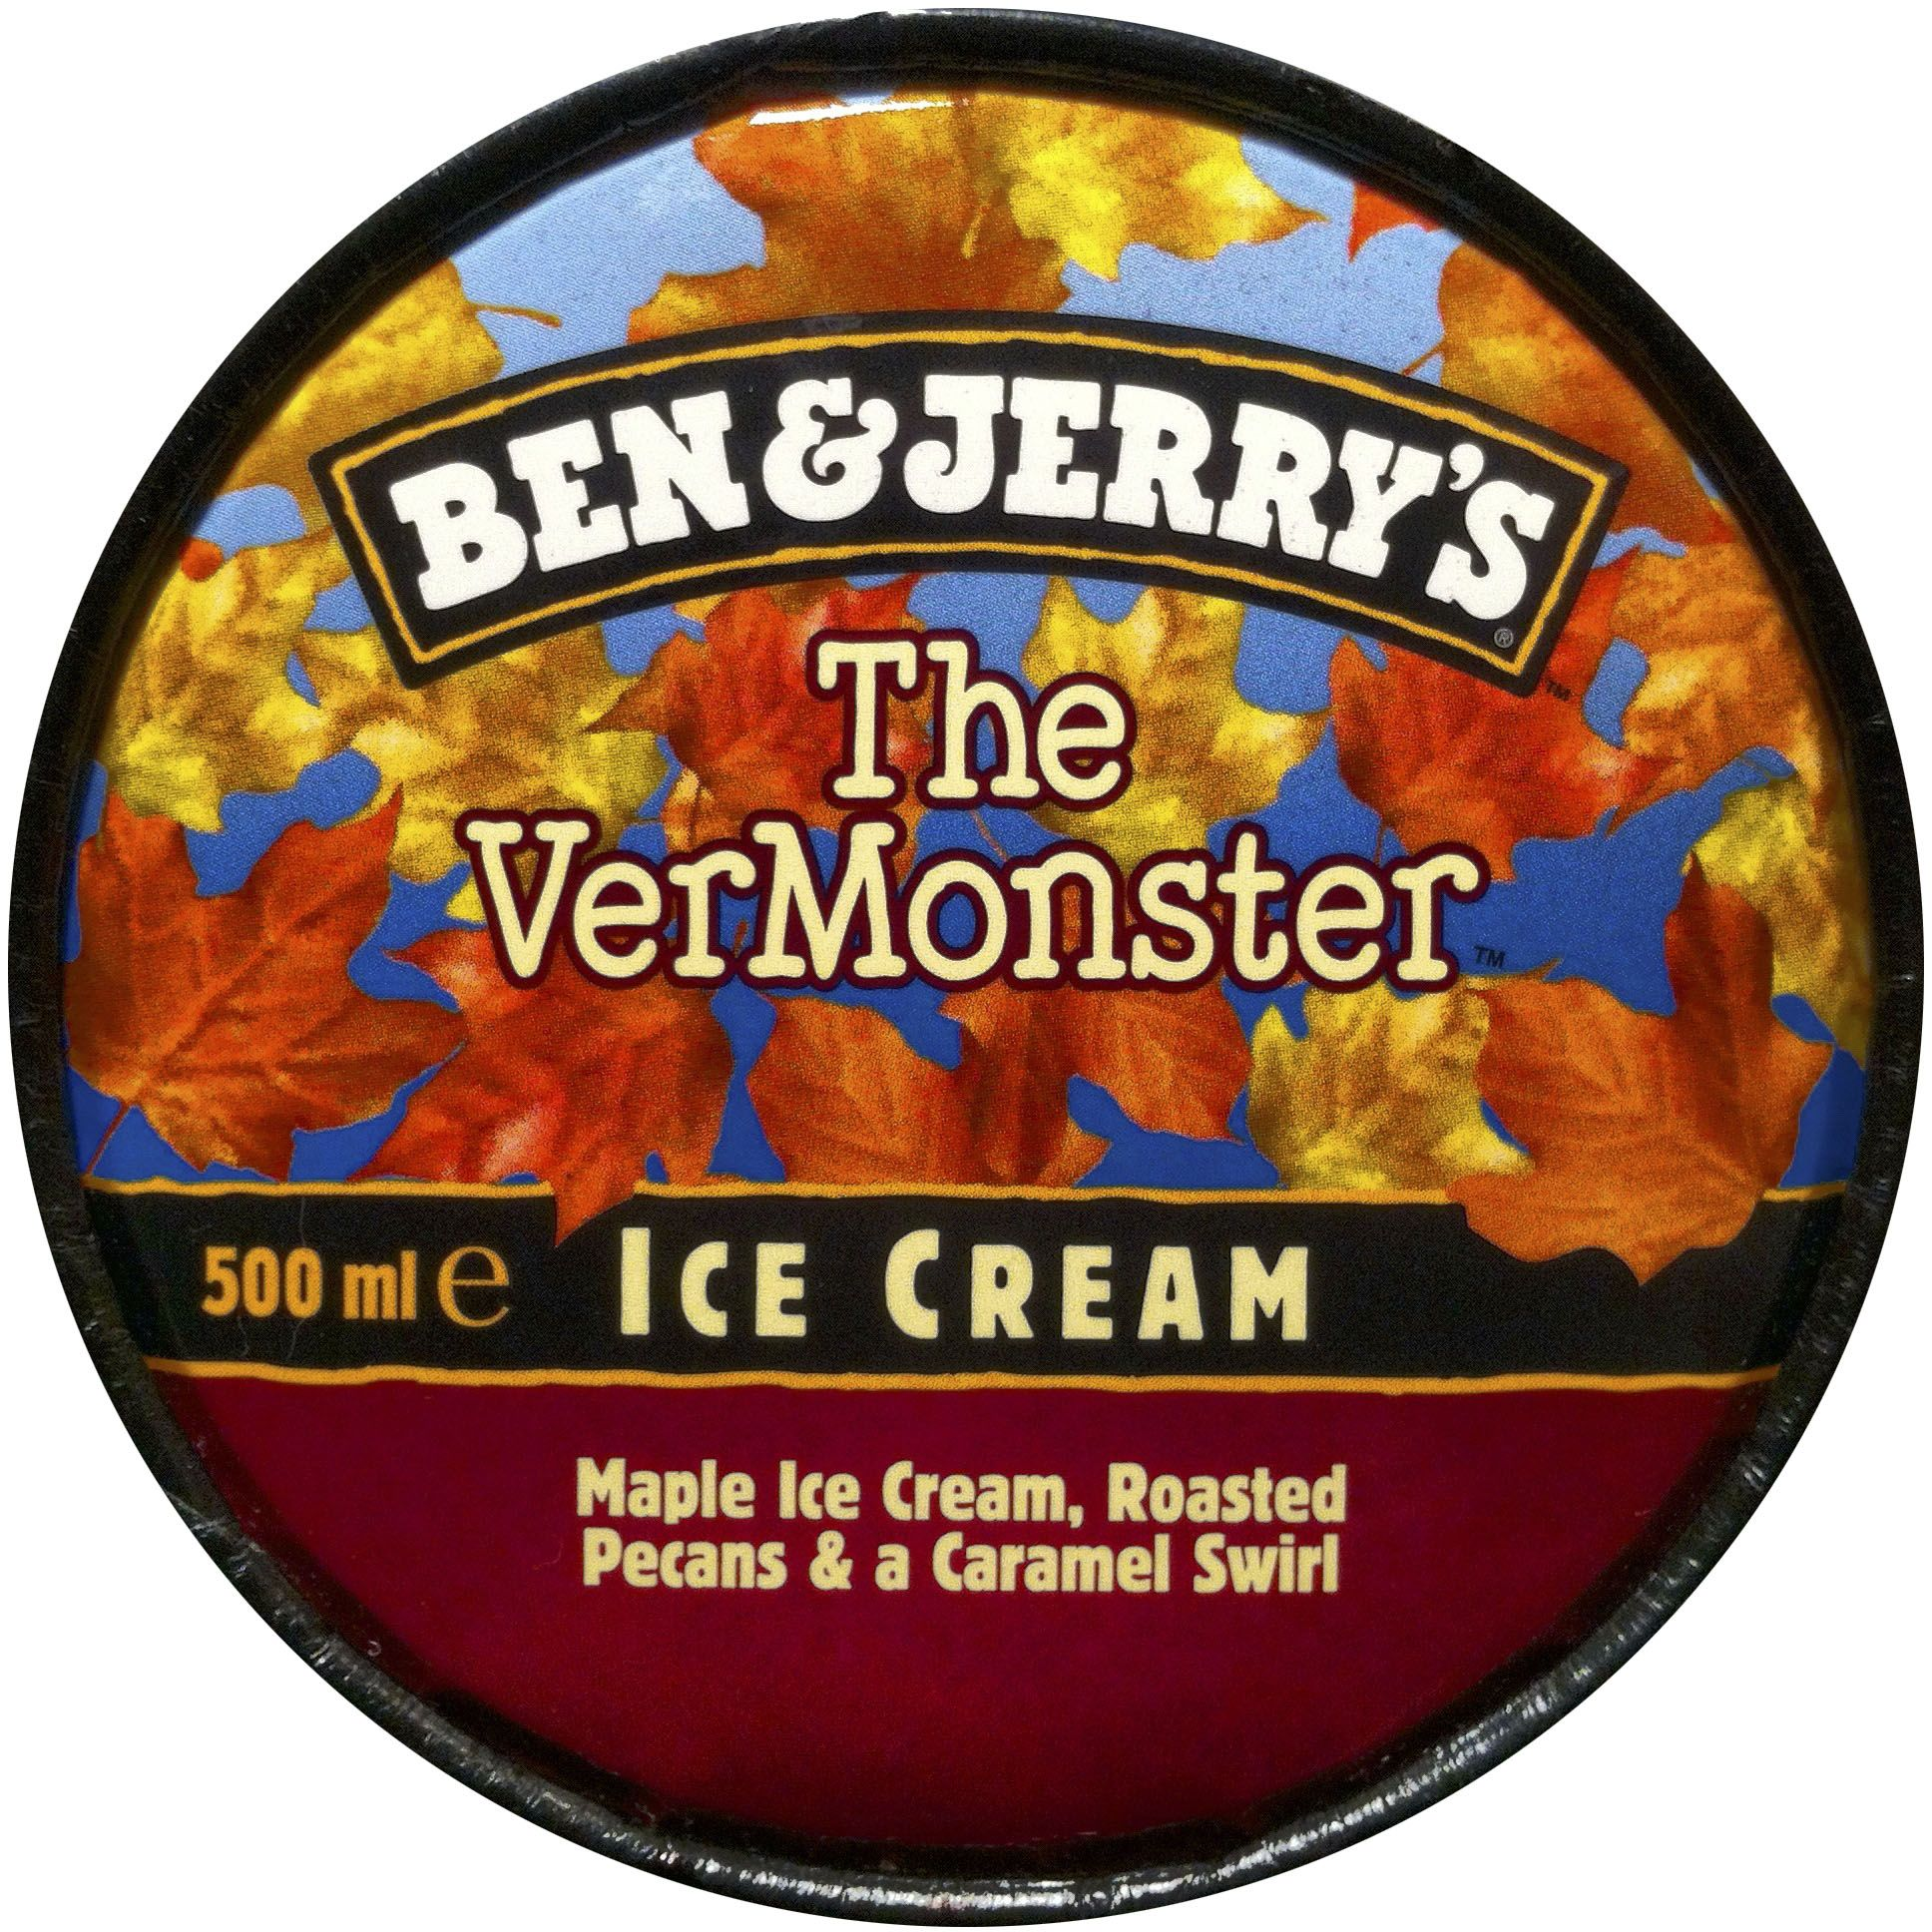 Uk Ben Jerry S The Vermonster Ice Cream Flavors Ben And Jerrys Ice Cream Maple Ice Cream